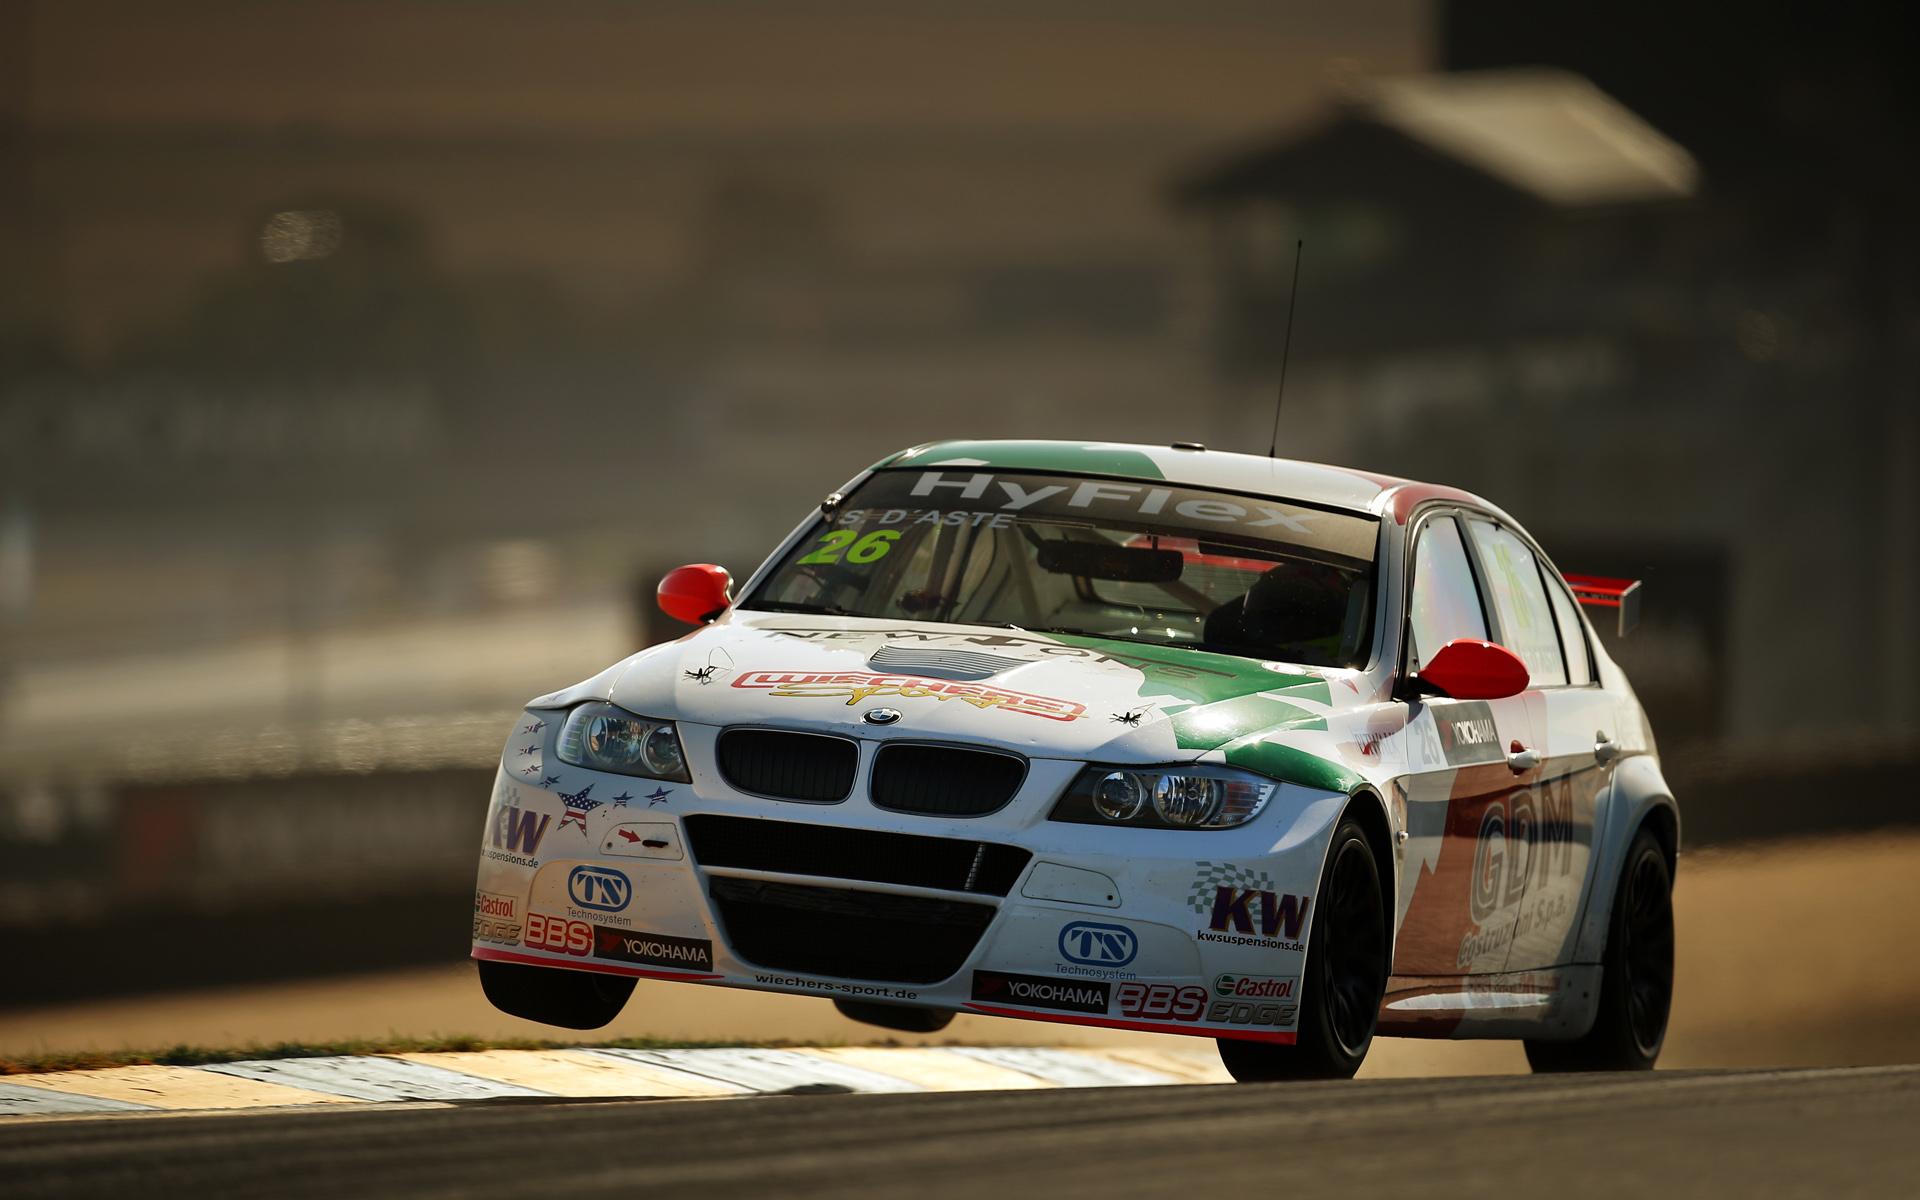 BMW World Touring Car Championship Wallpaper